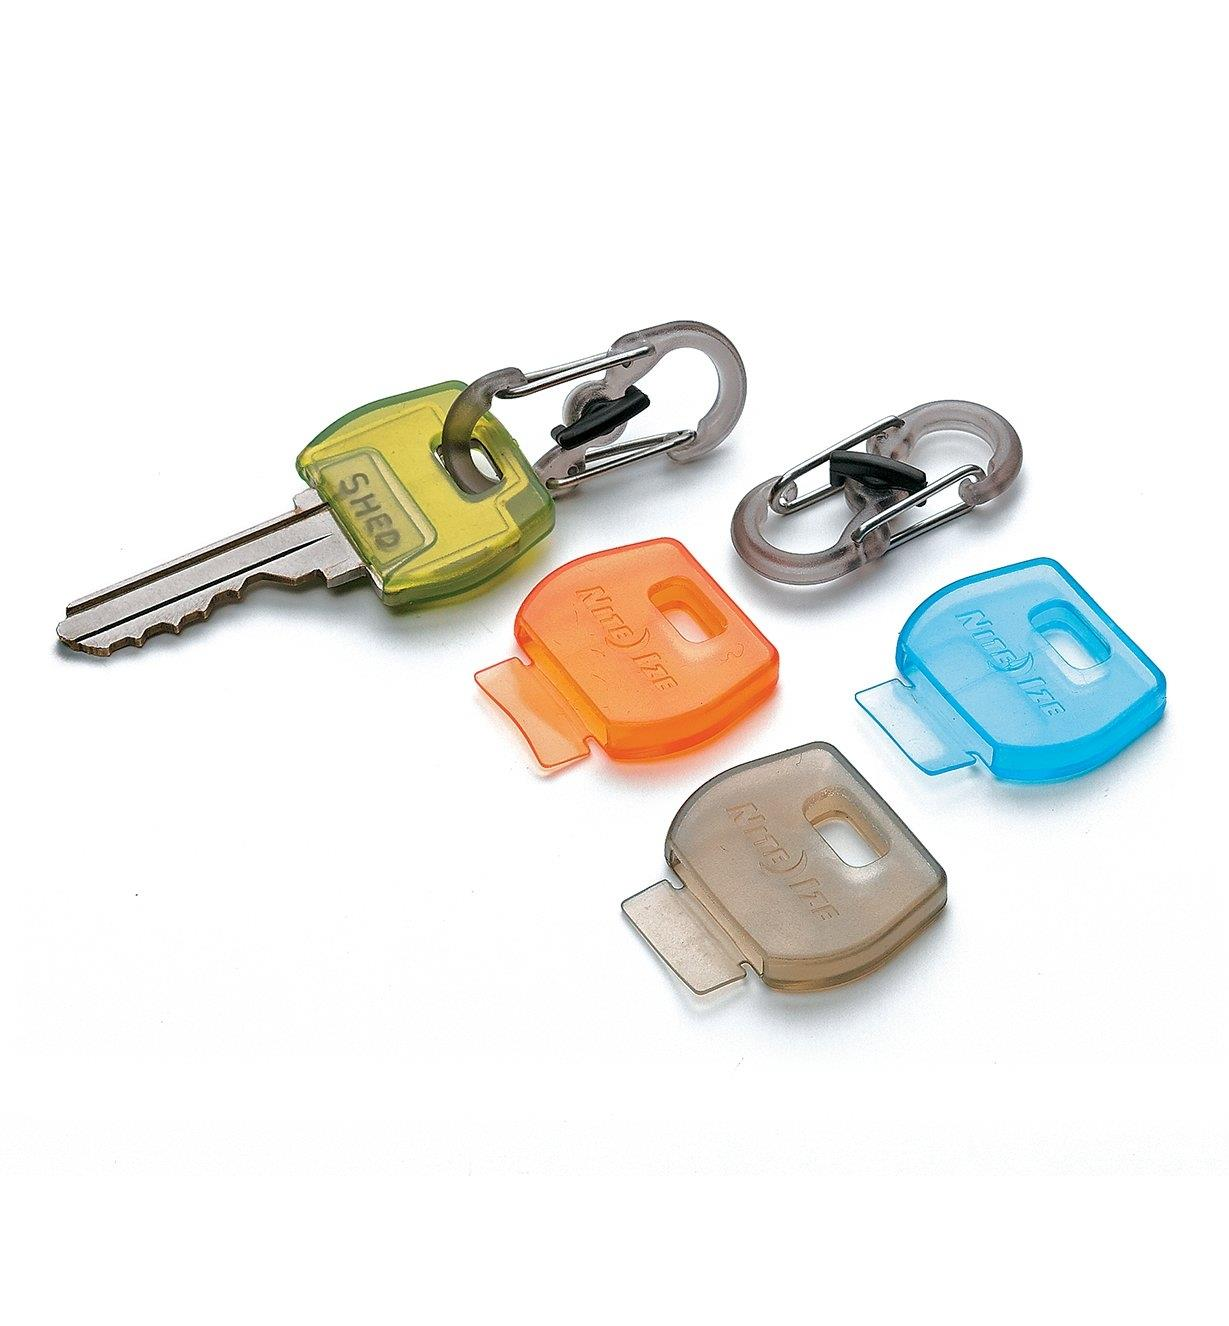 68K0764 - Set of 4 IdentiKey Covers & 2 Hooks